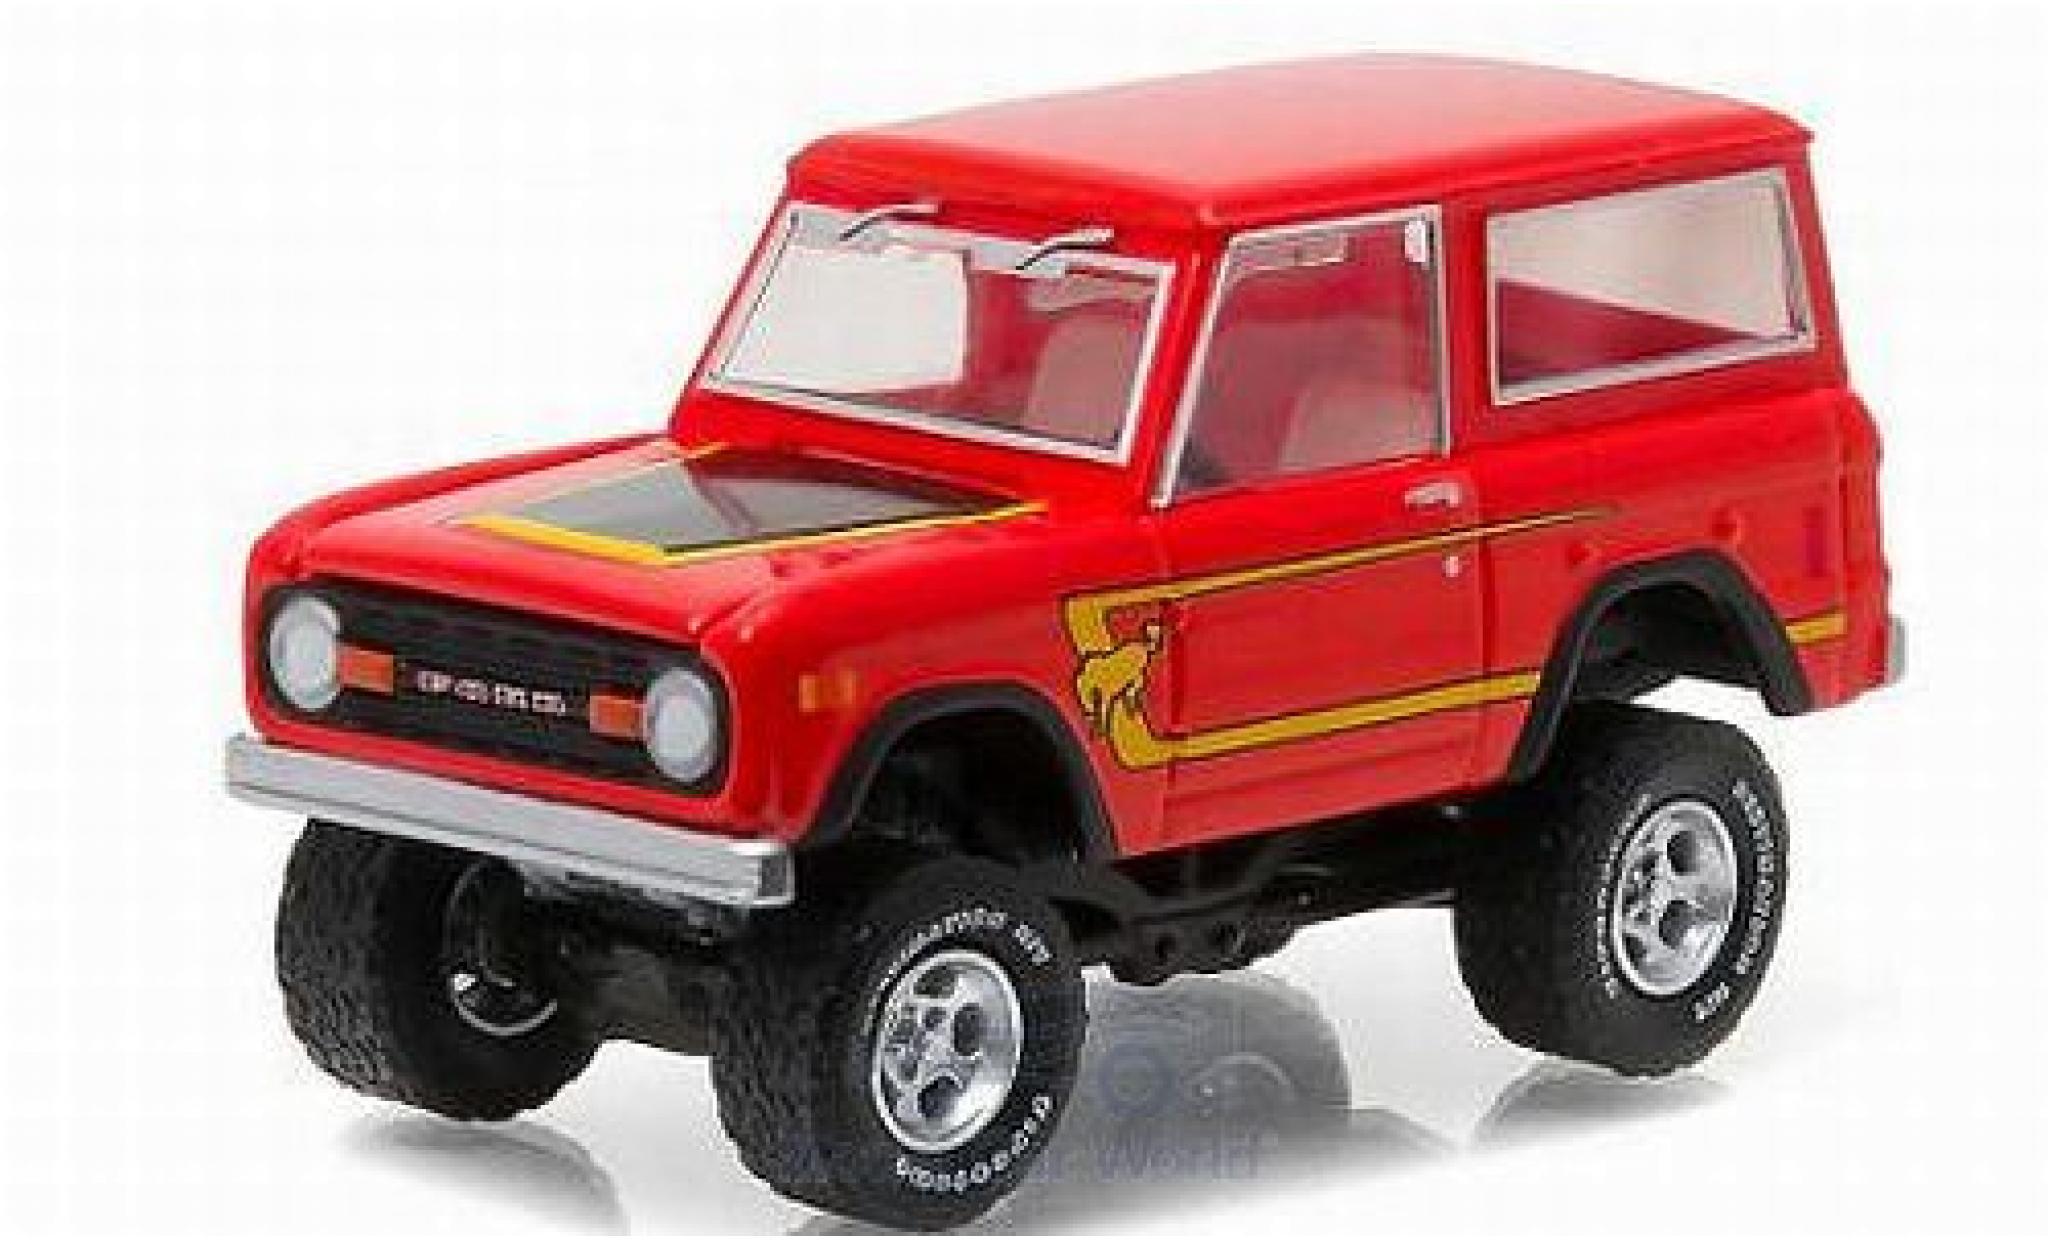 Ford Bronco 1/64 Greenlight rot/Dekor 1977 All Terrain Series 4 ohne Vitrine